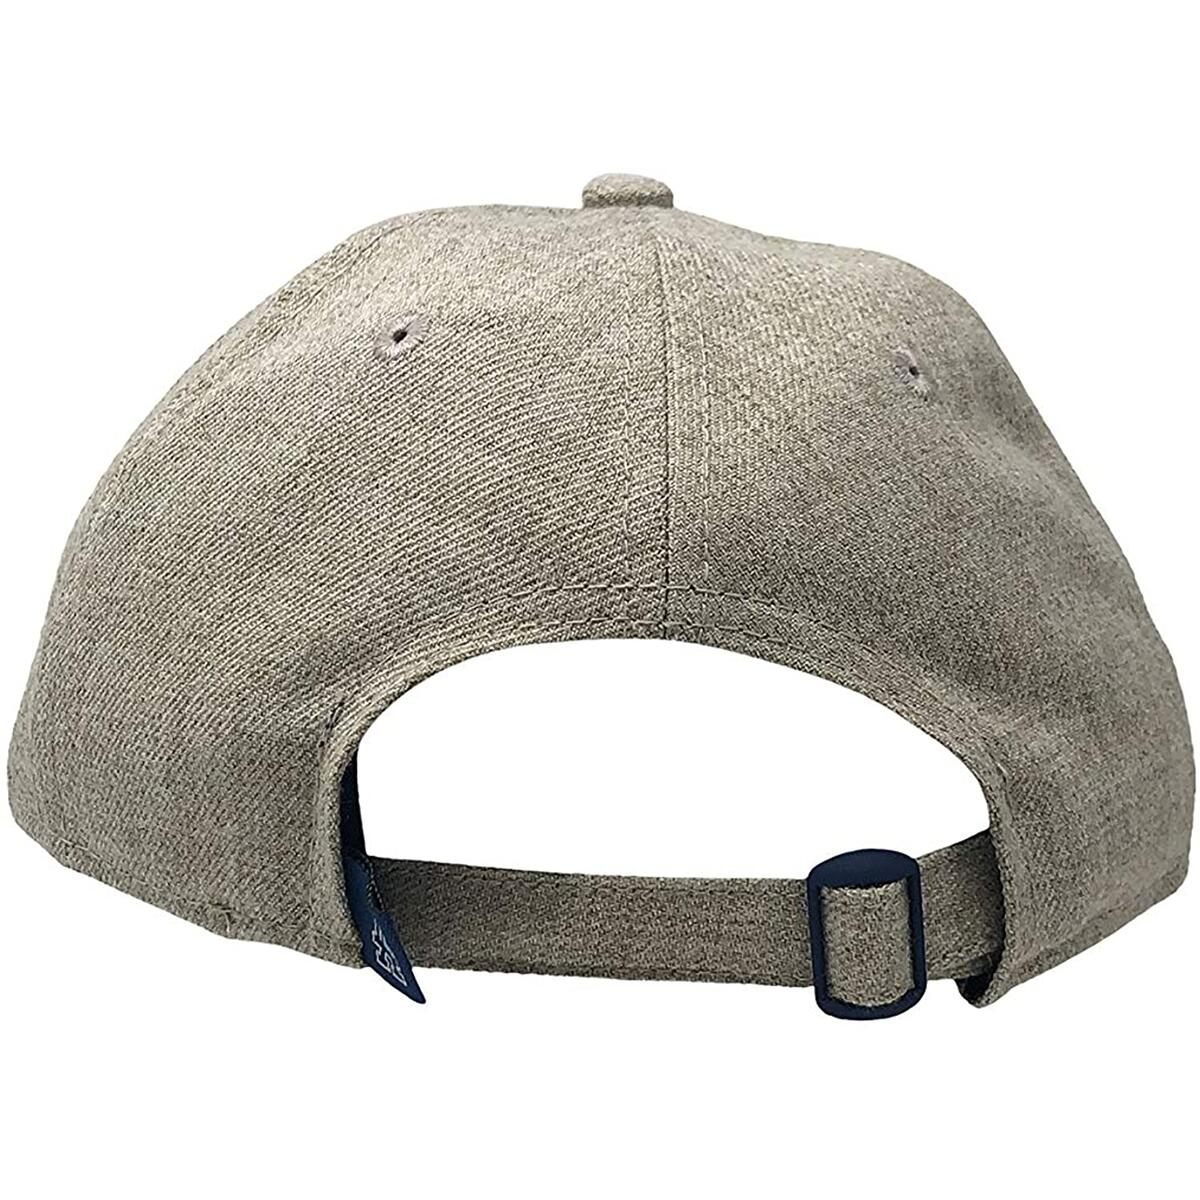 New Era Los Angeles Dodgers Adjustable Strapback Hat MLB 9Twenty Curve Bill Caps (One Size, Beige NEC)